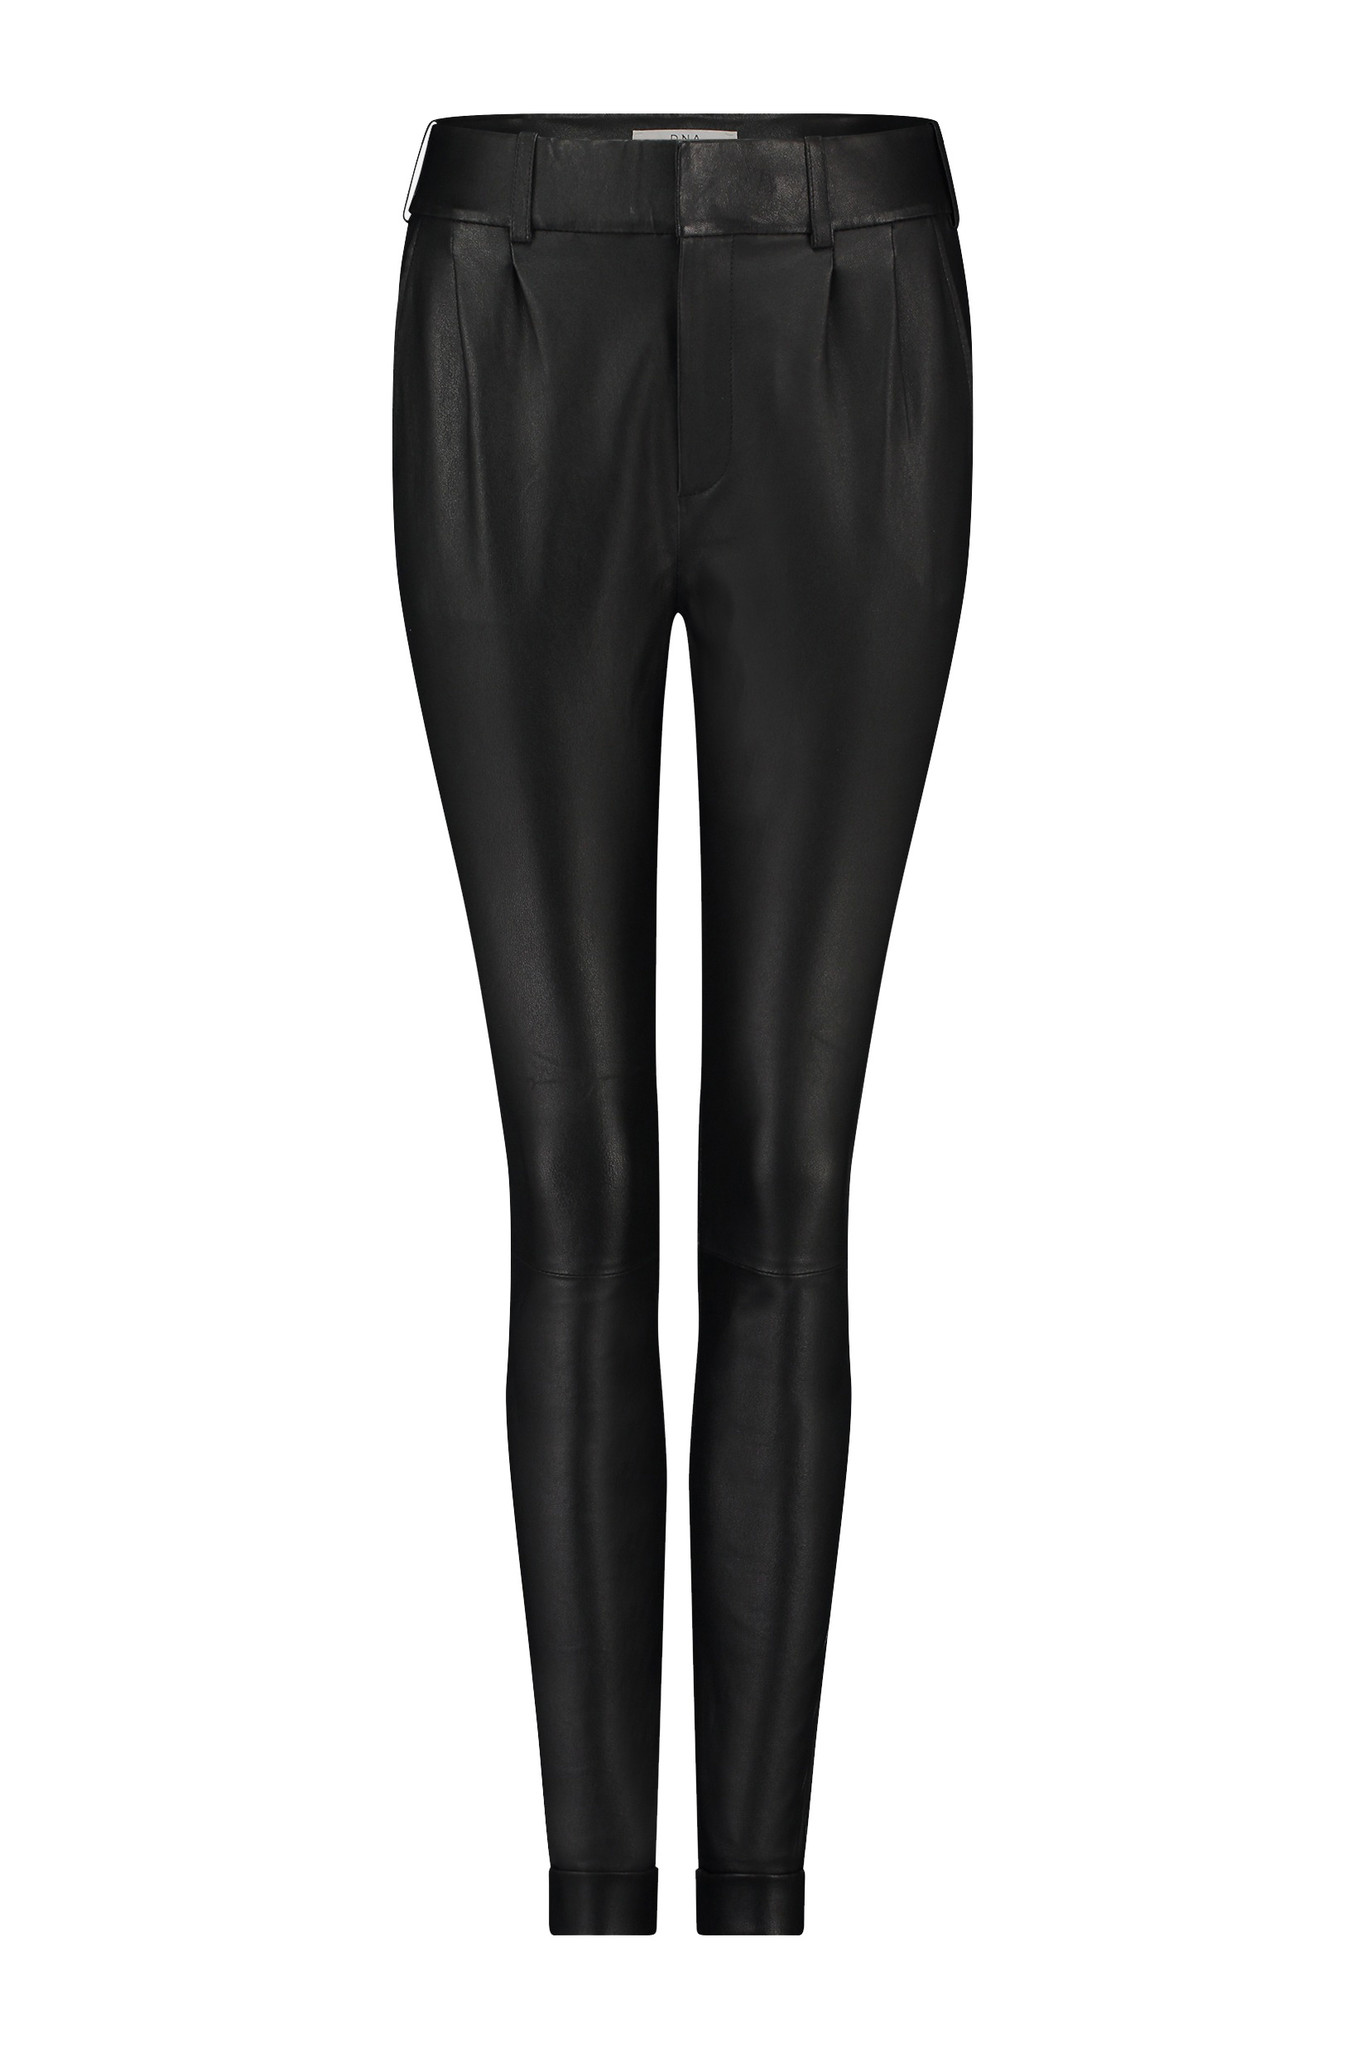 Pera Leather Pant - Black-1